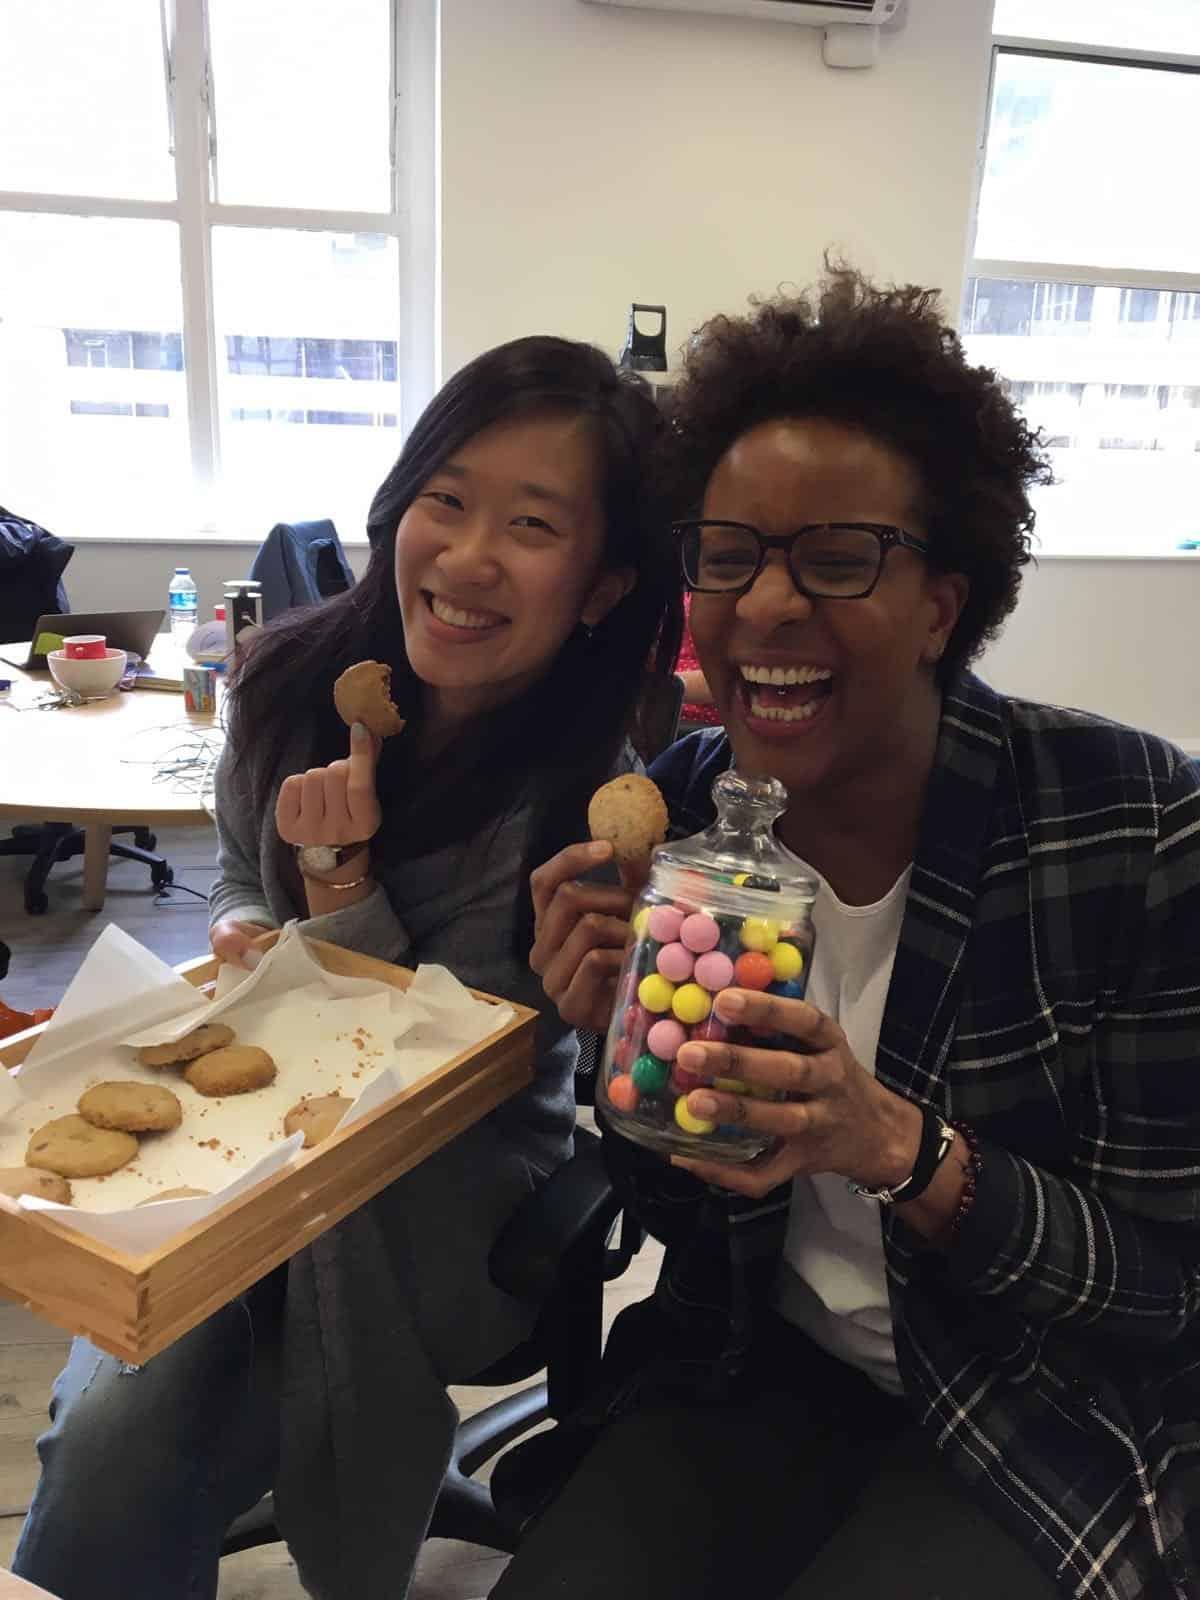 Two people smiling eating cookies